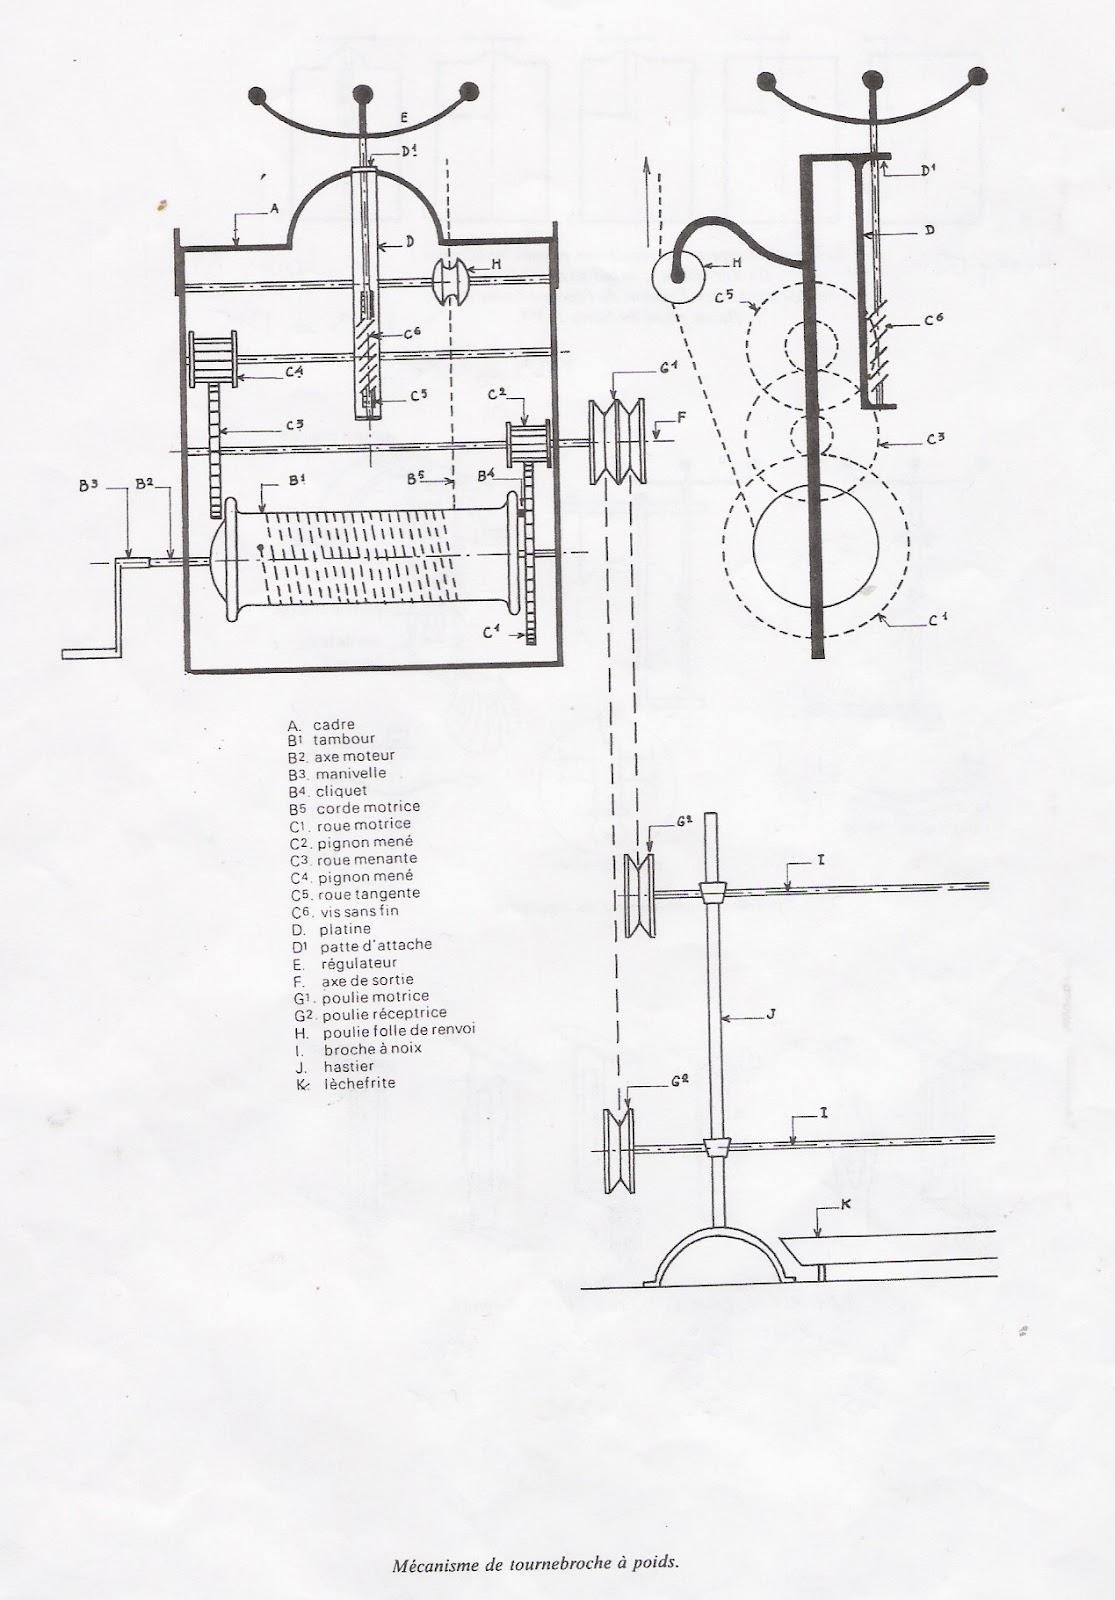 Plan Foyer Tourne Broche : Ancien tournebroche mural